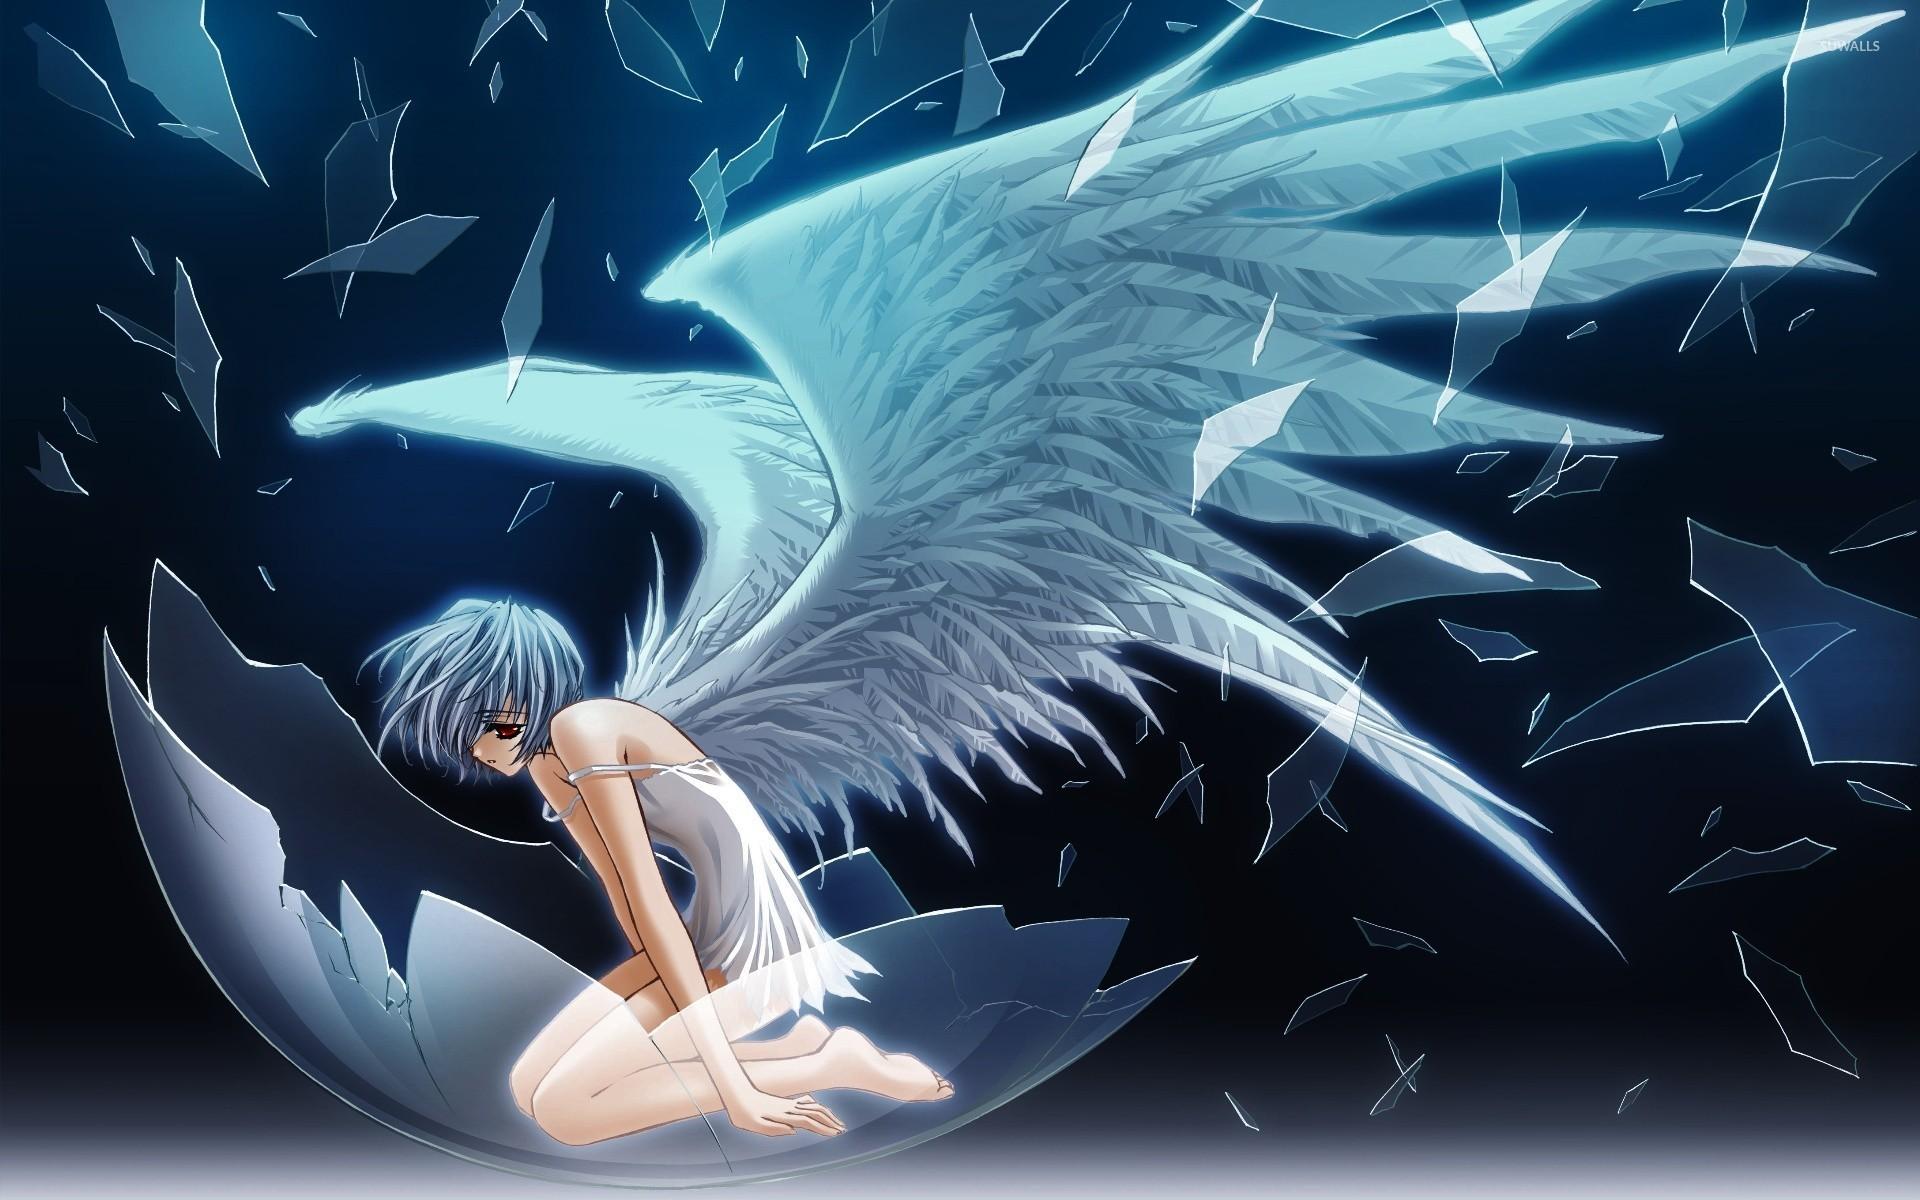 evangelion wallpaper hd anime - photo #33